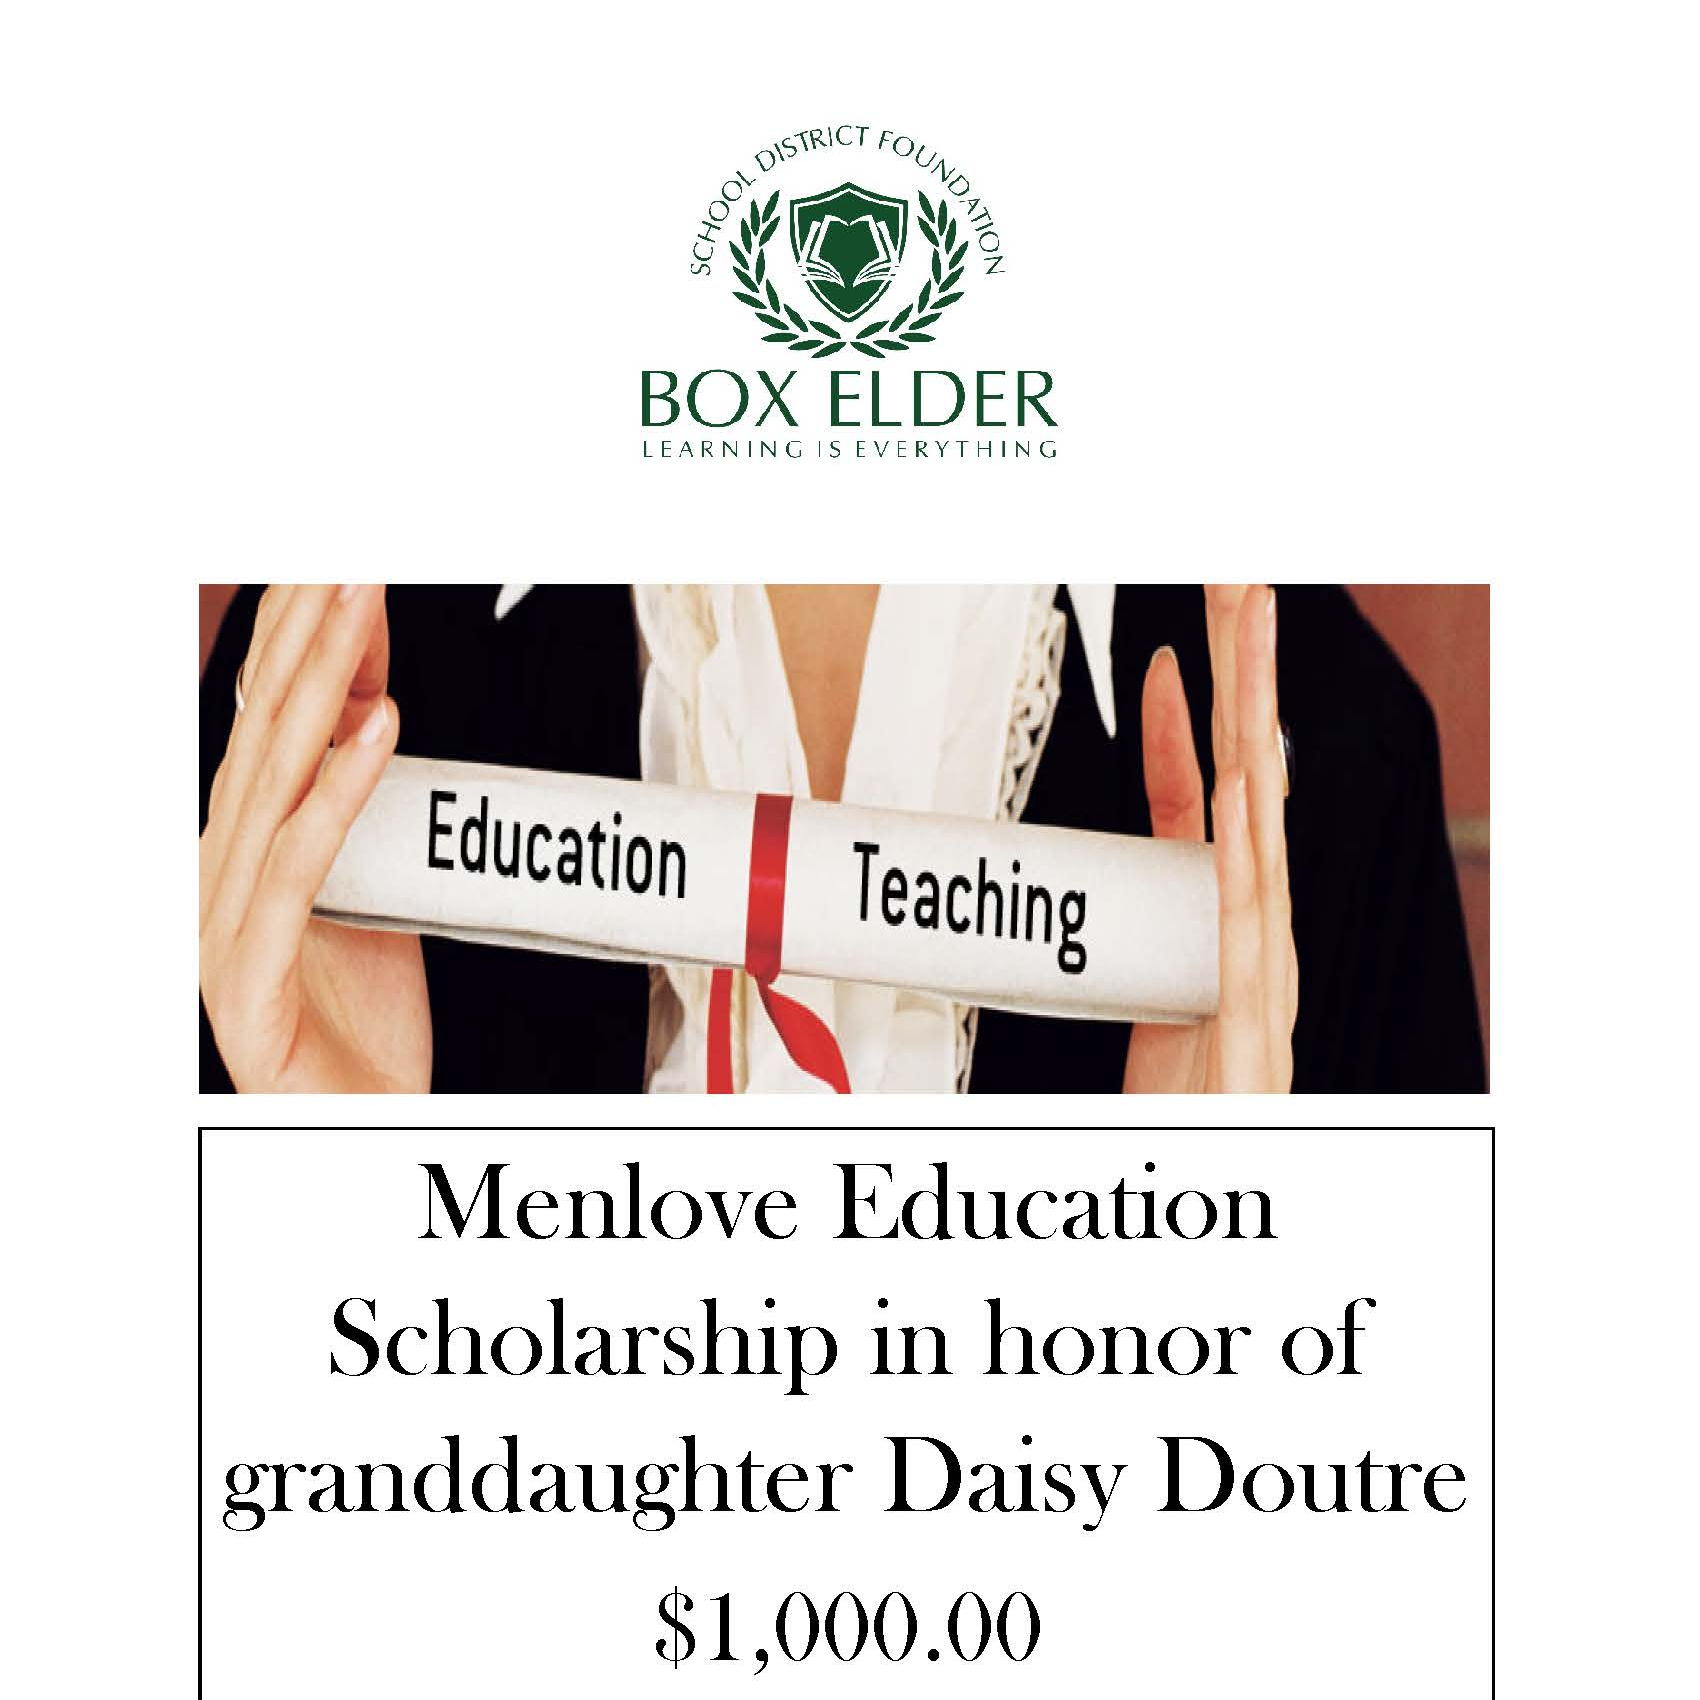 Menlove Education Scholarship